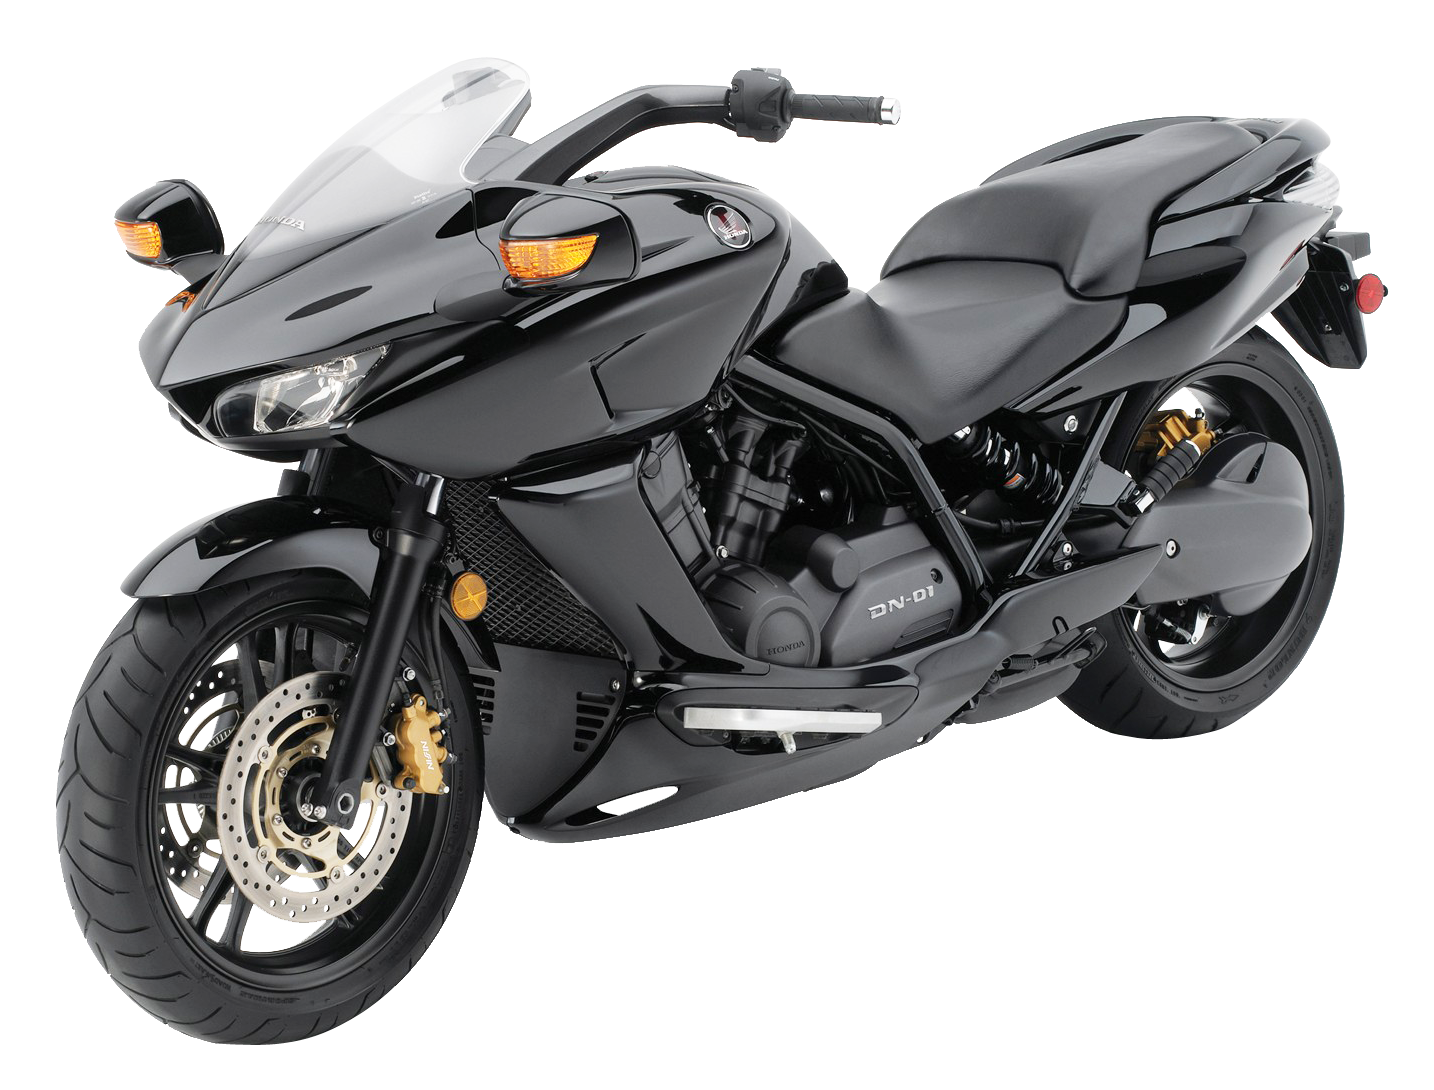 Black Honda DN 01 PNG Image